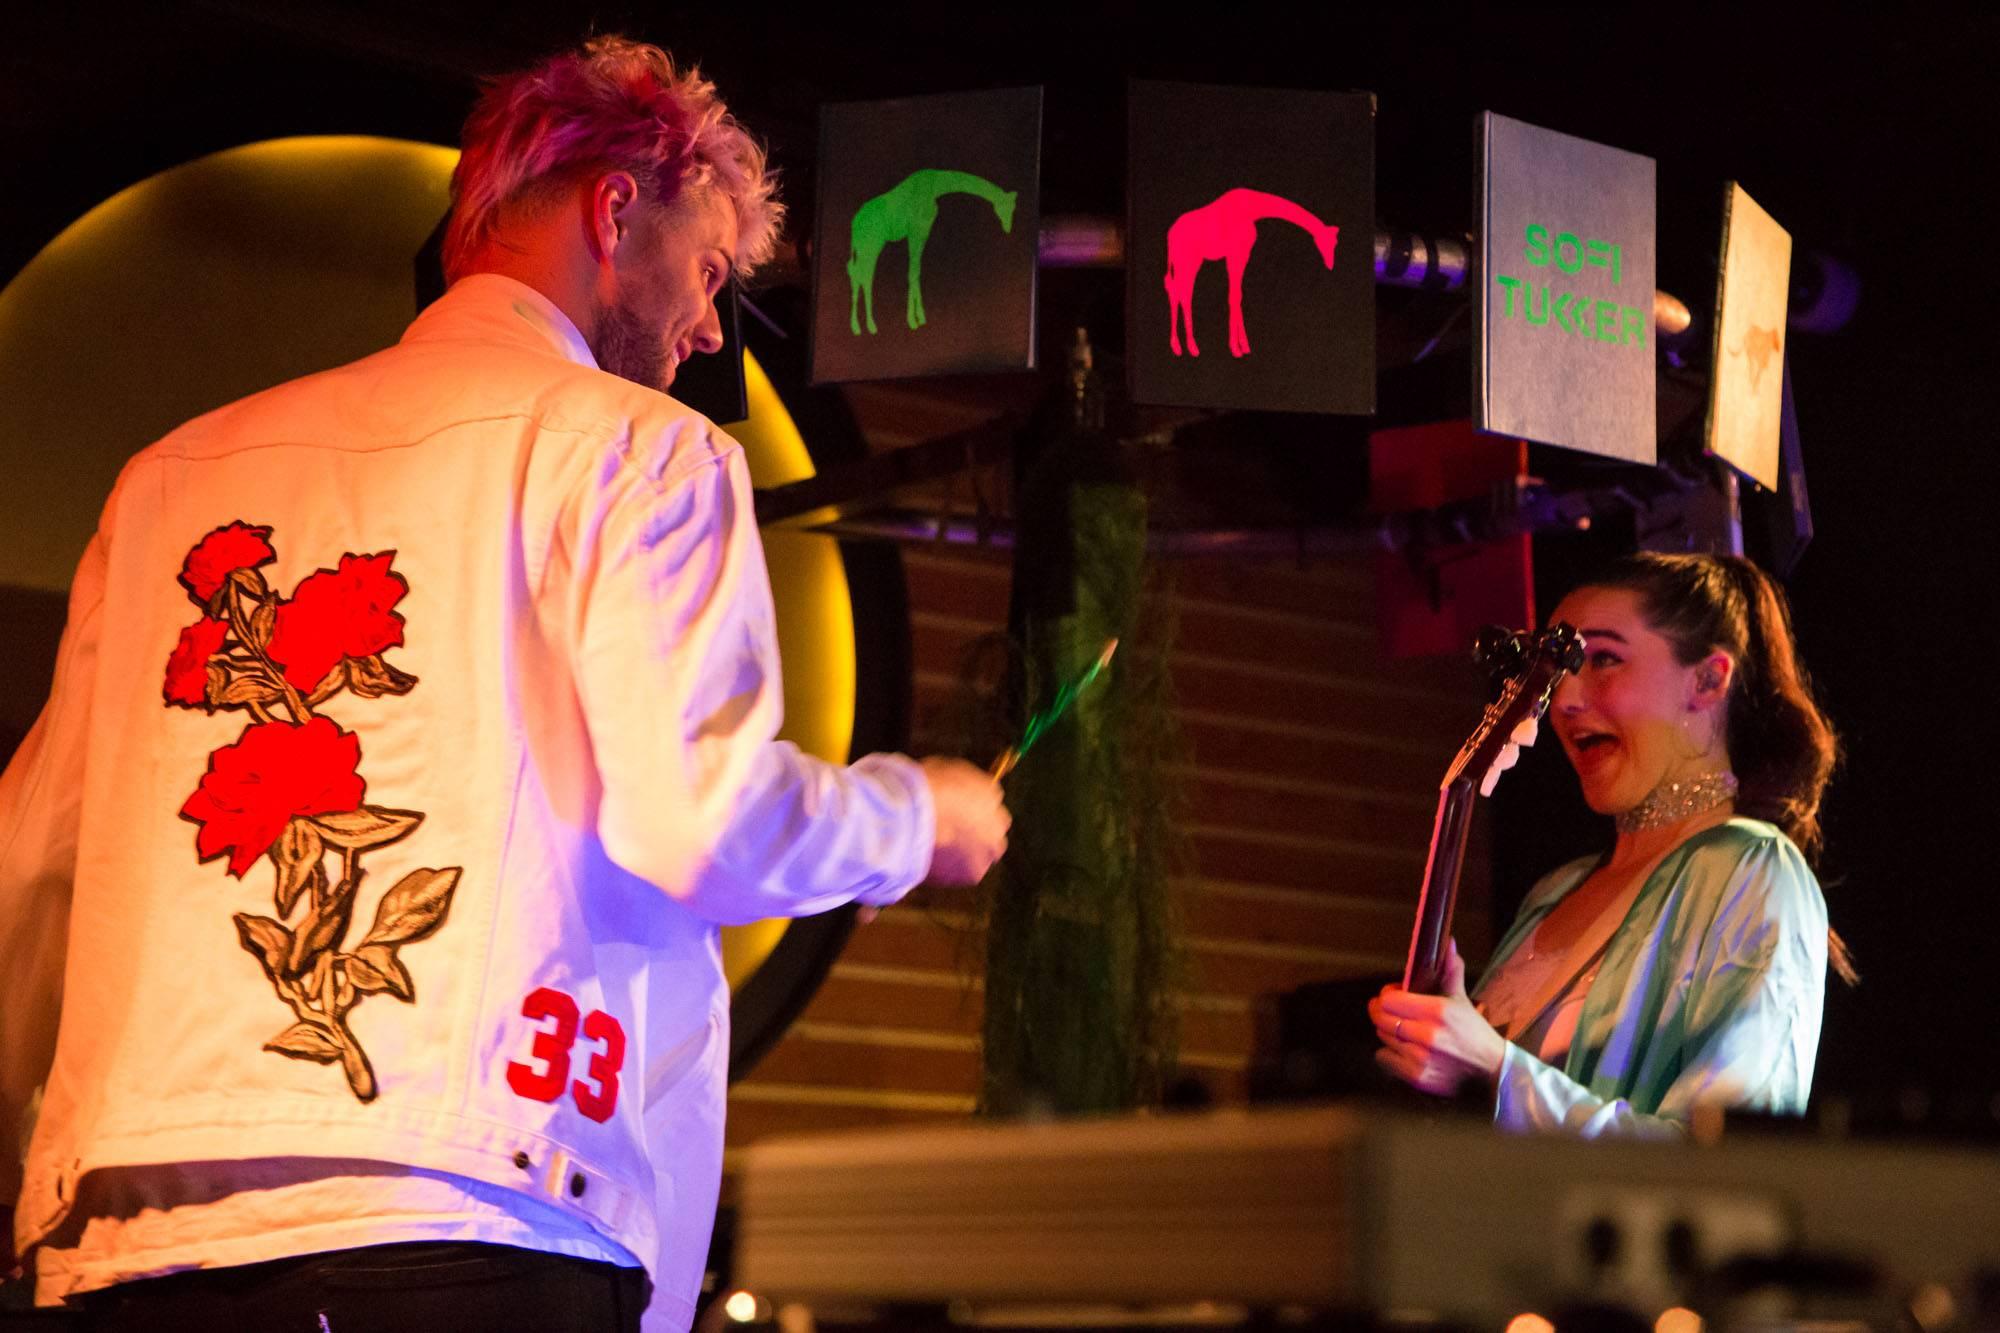 Sofi Tukker at Fortune Sound Club, Vancouver, Apr. 29 2017. Kirk Chantraine photo.